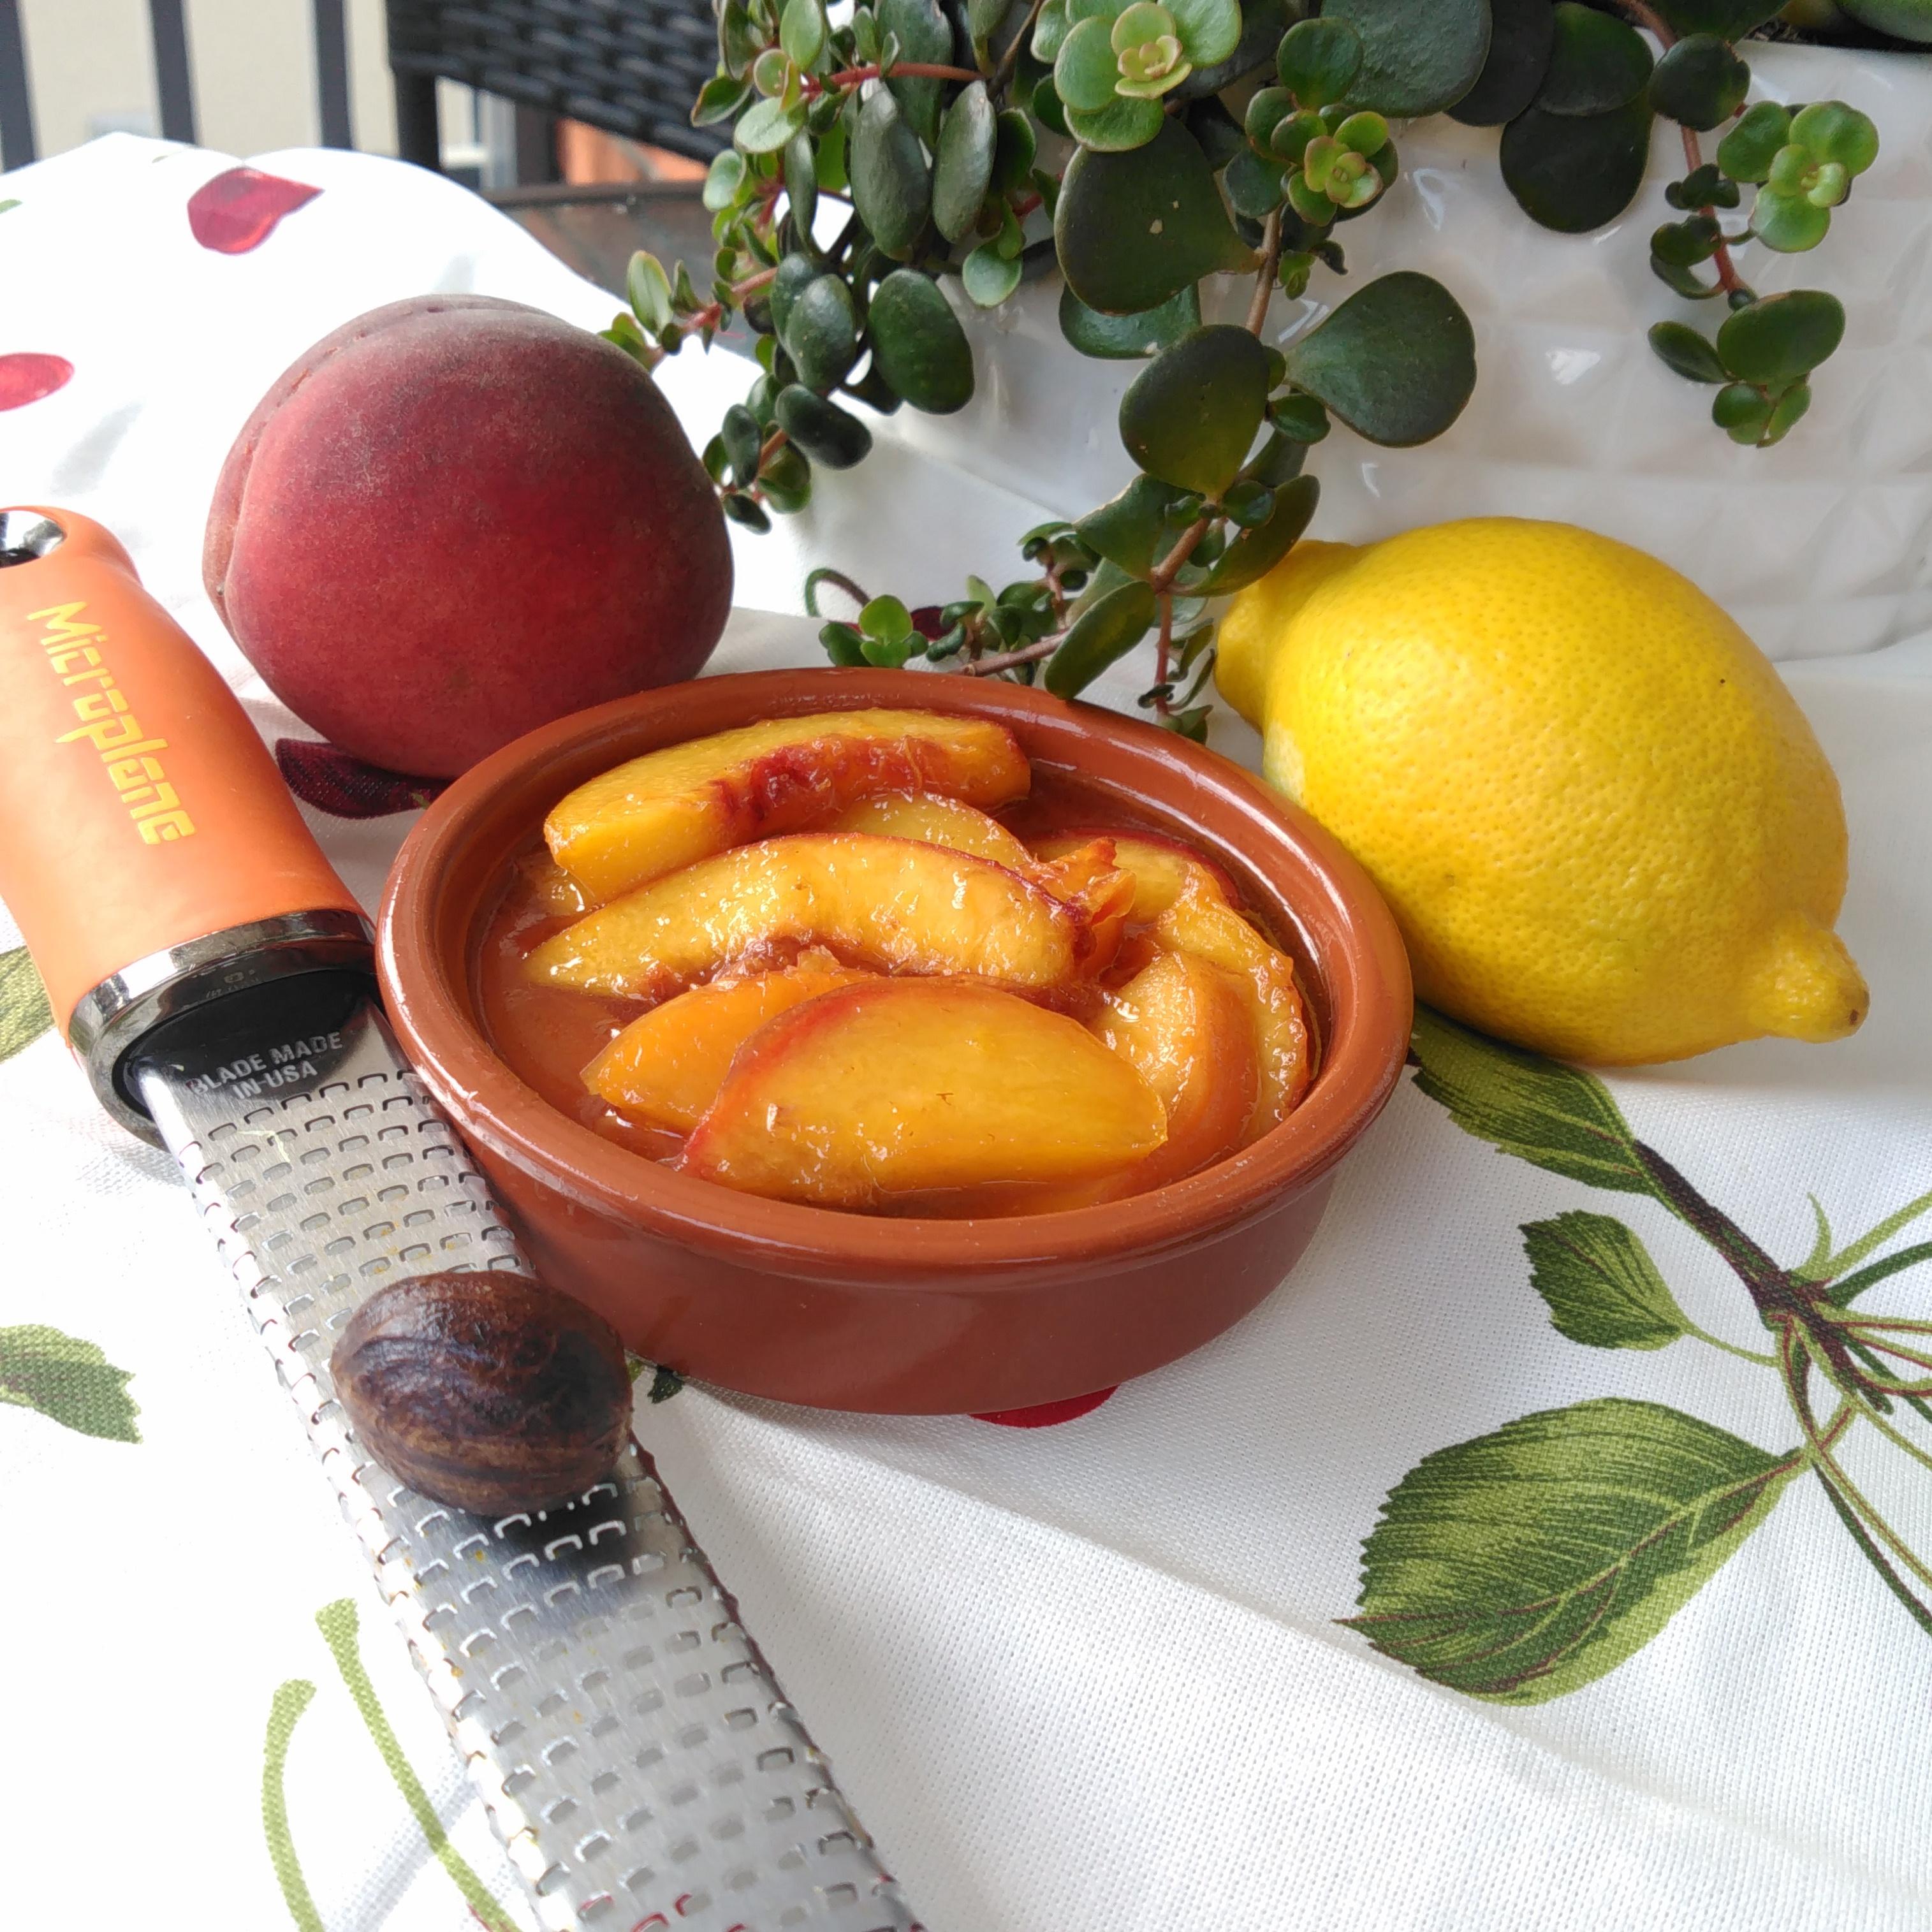 Maple-Peach Ice Cream Topping